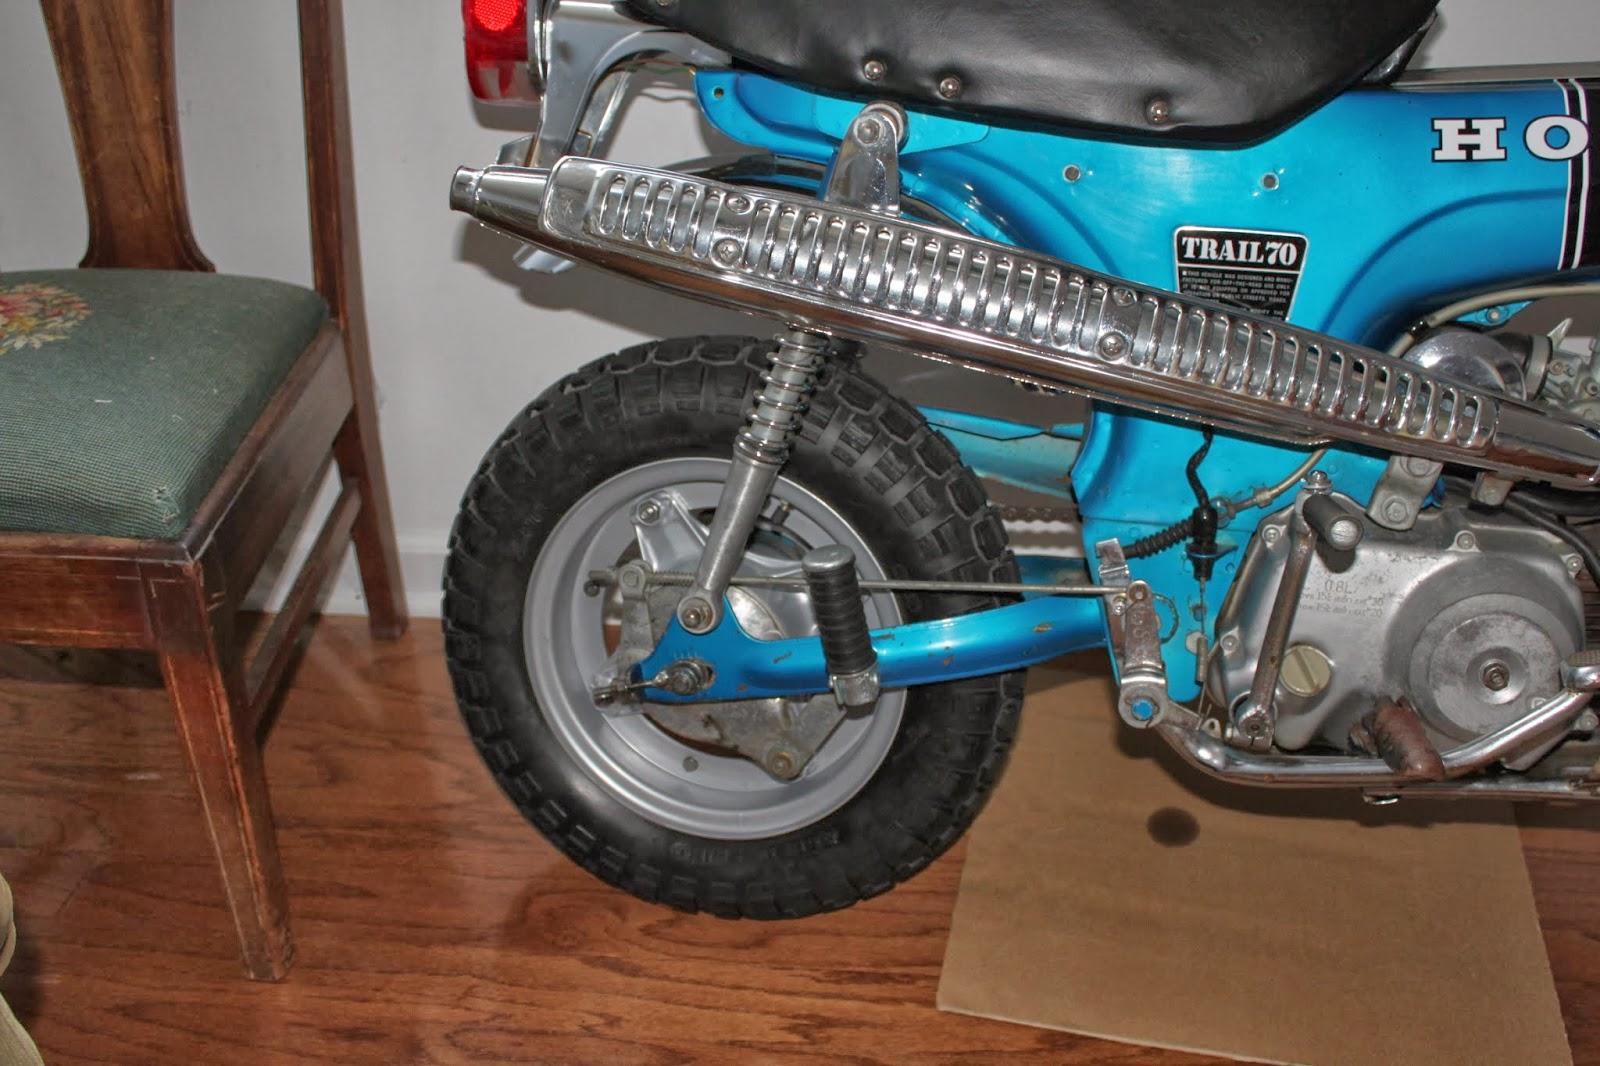 1970 Honda Ct70 Trail Bike 2000 Ann Arbor Grooshs Garage Blue